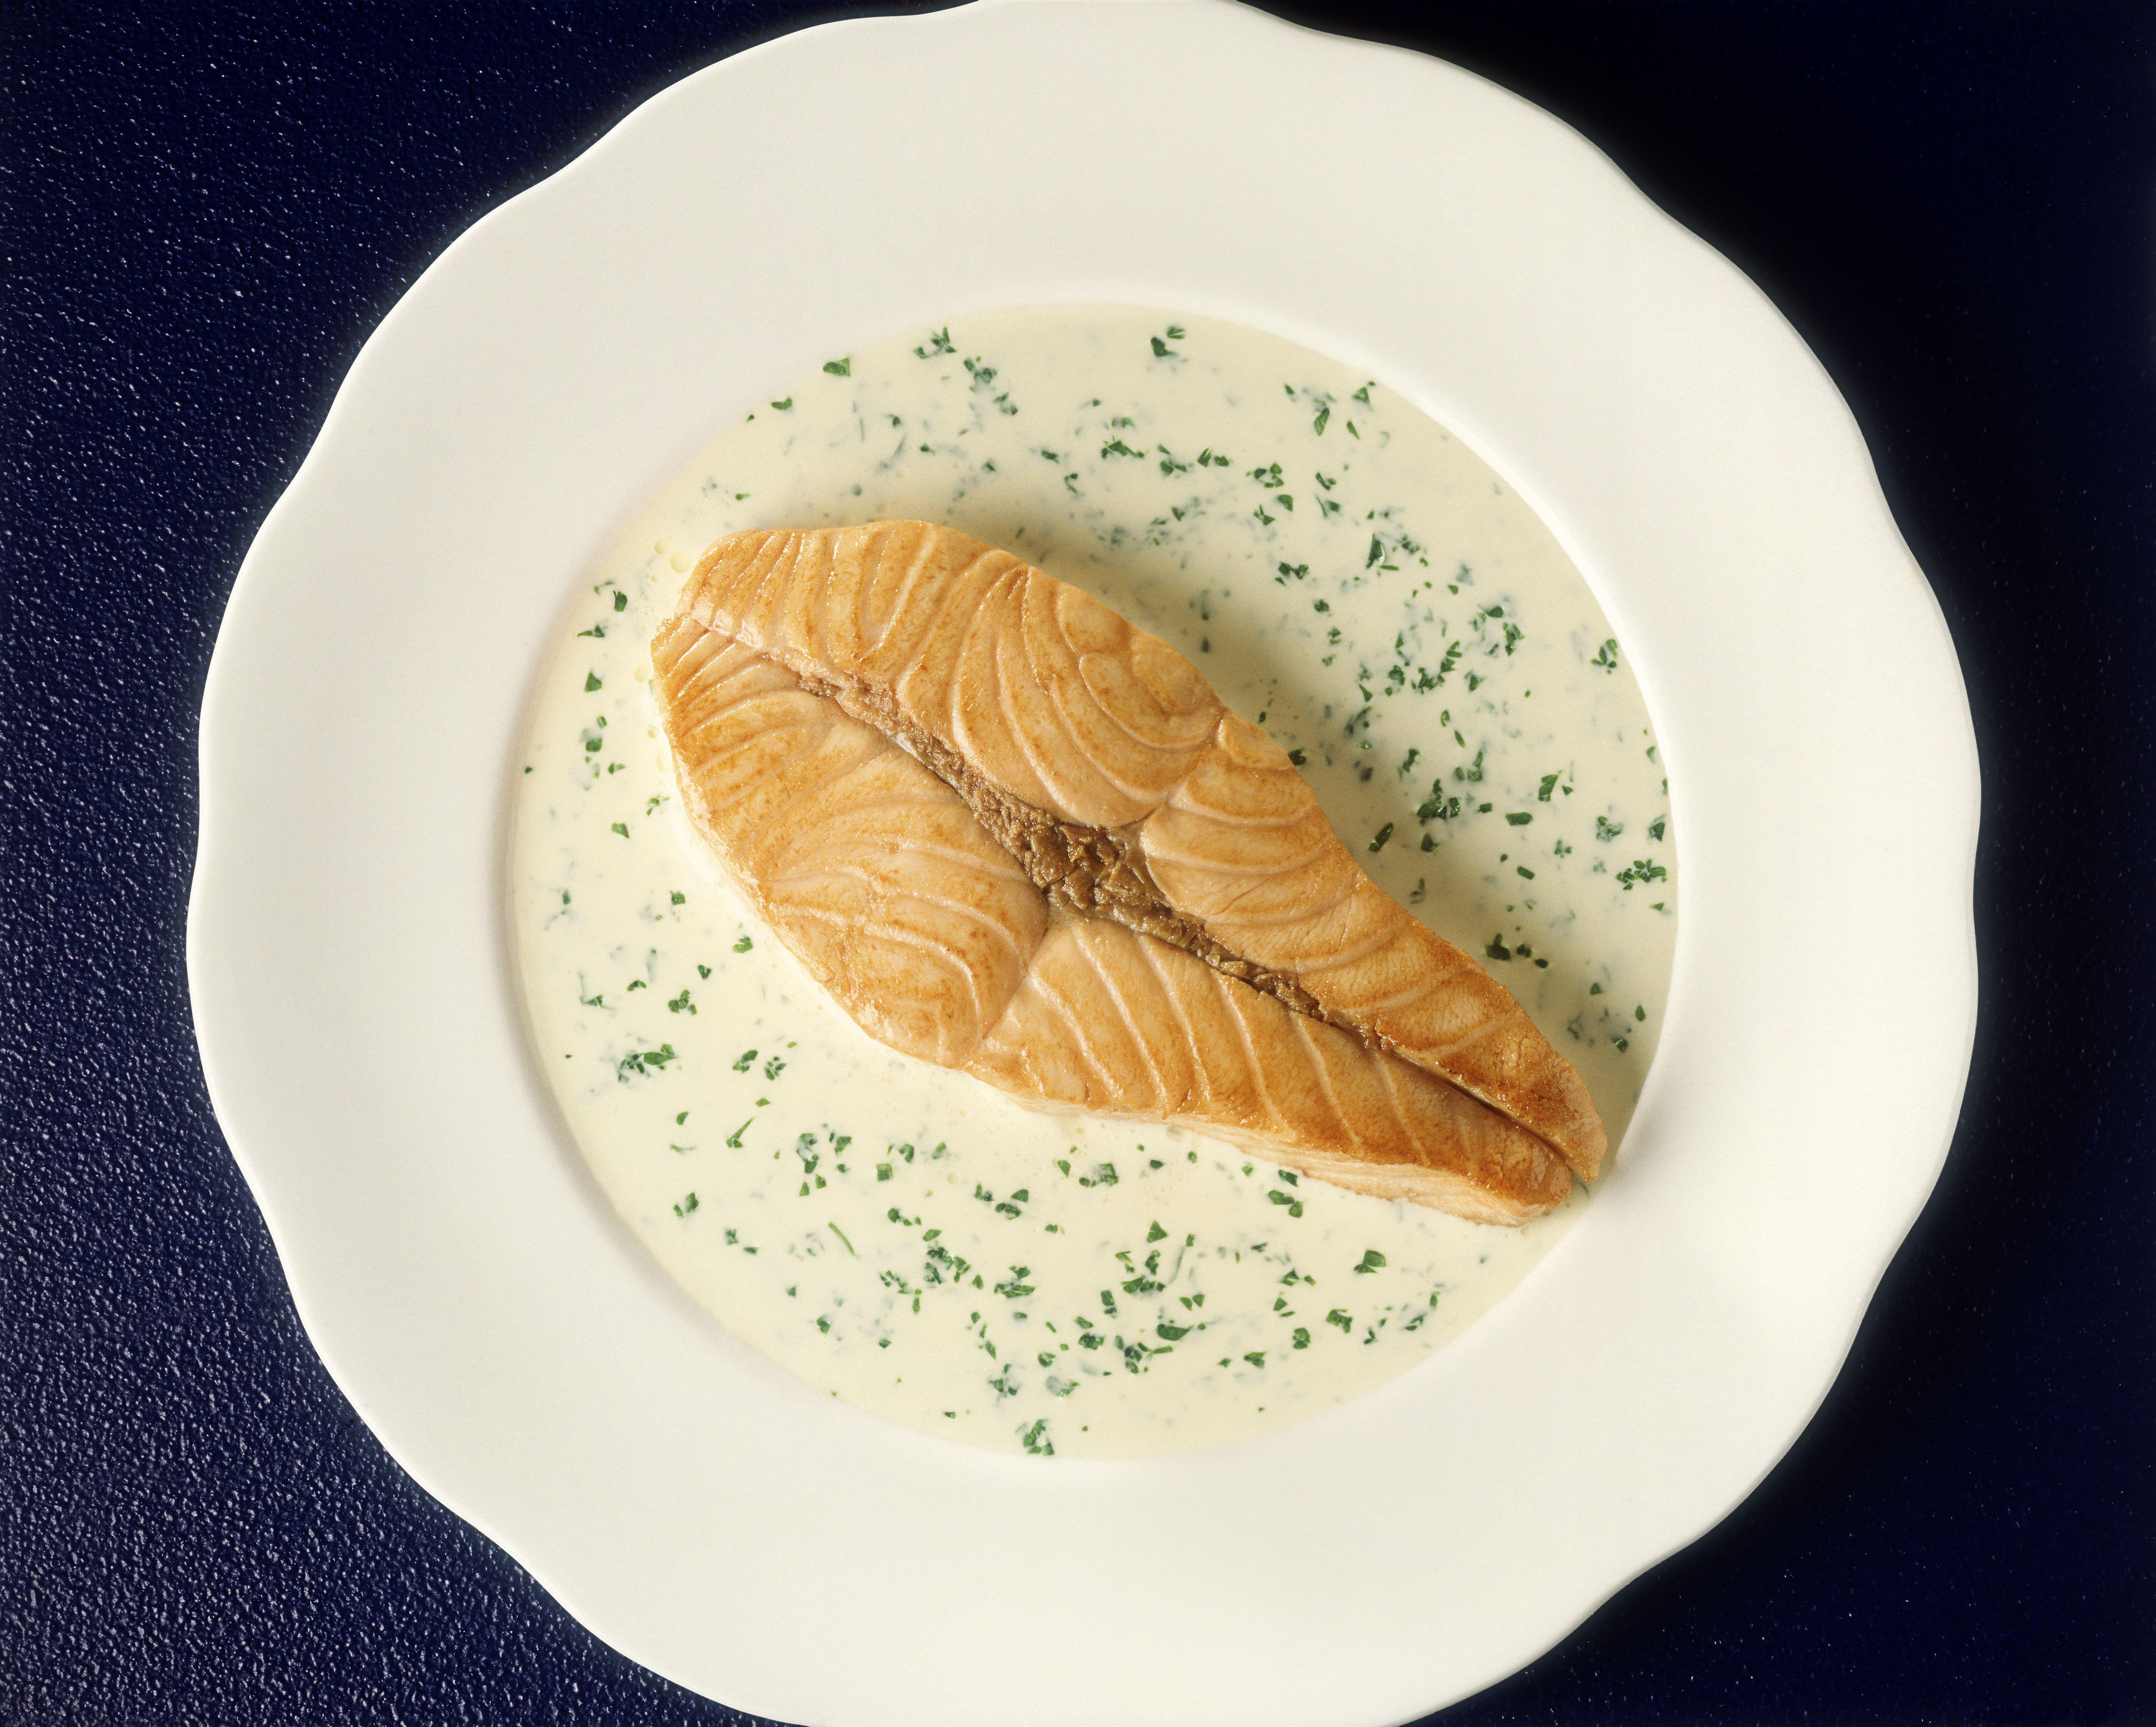 Salmon steak with parsley & cream sauce